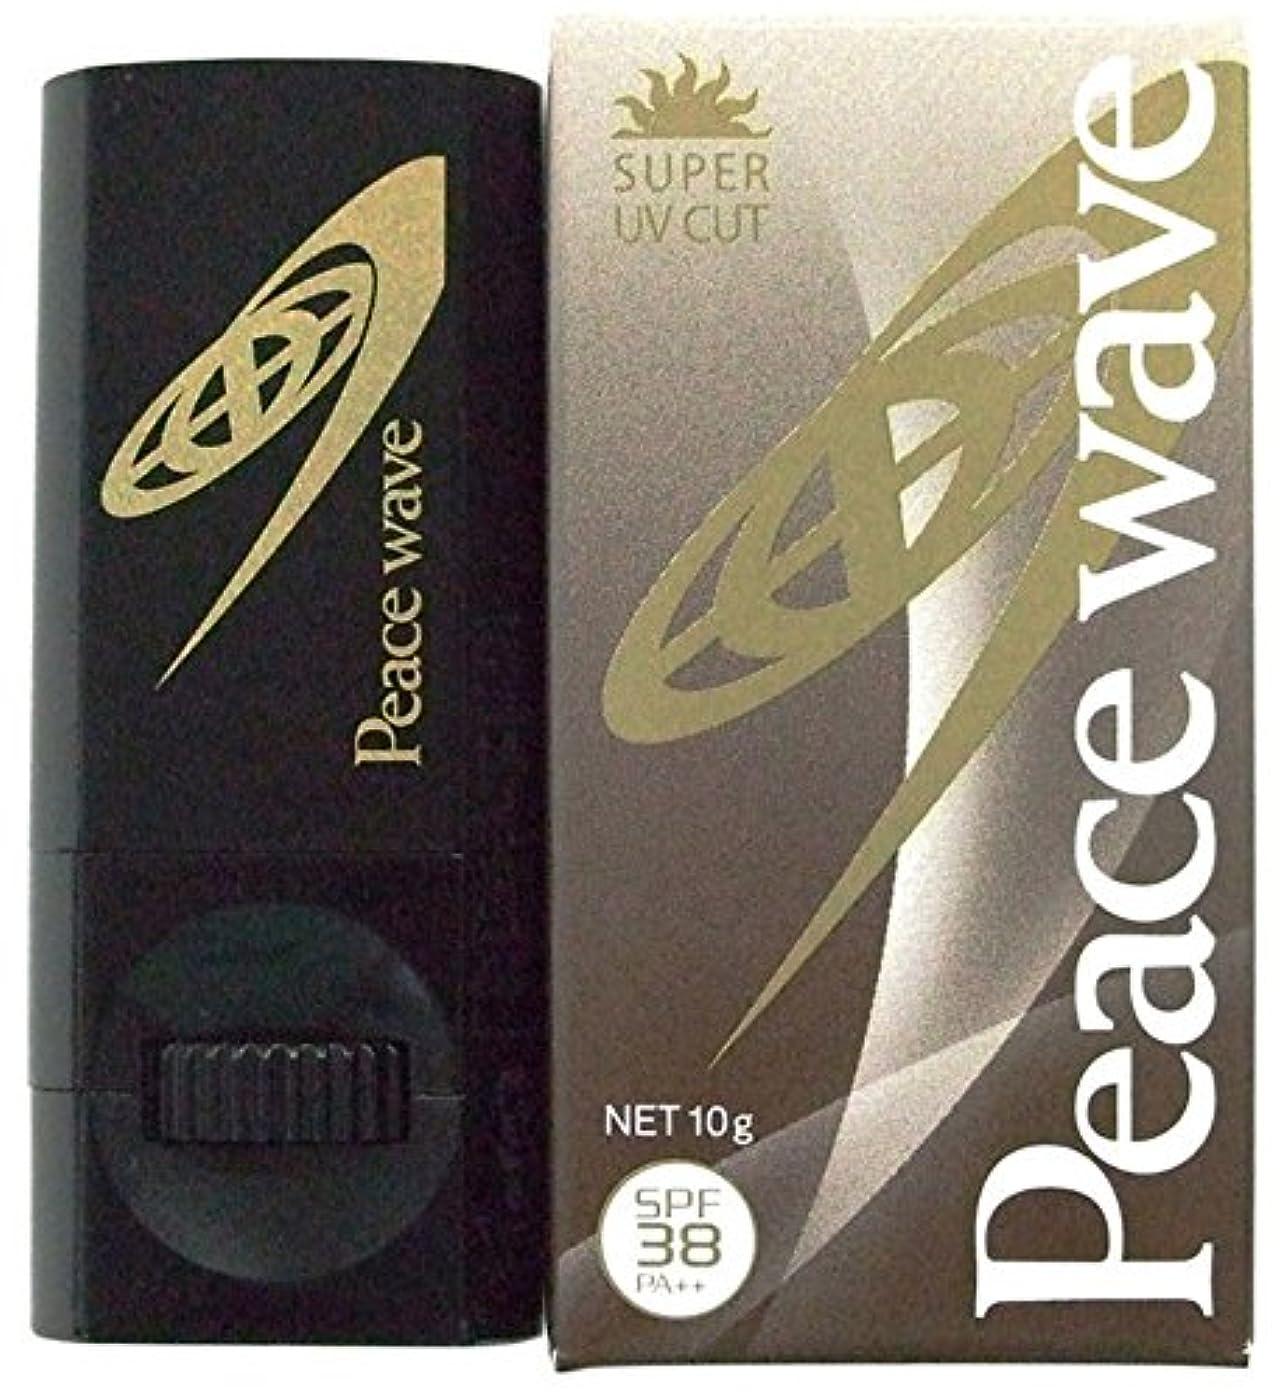 PEACE WAVE 日焼け止め UVフェイススティック SPF38 PA++ タン 10g 580281